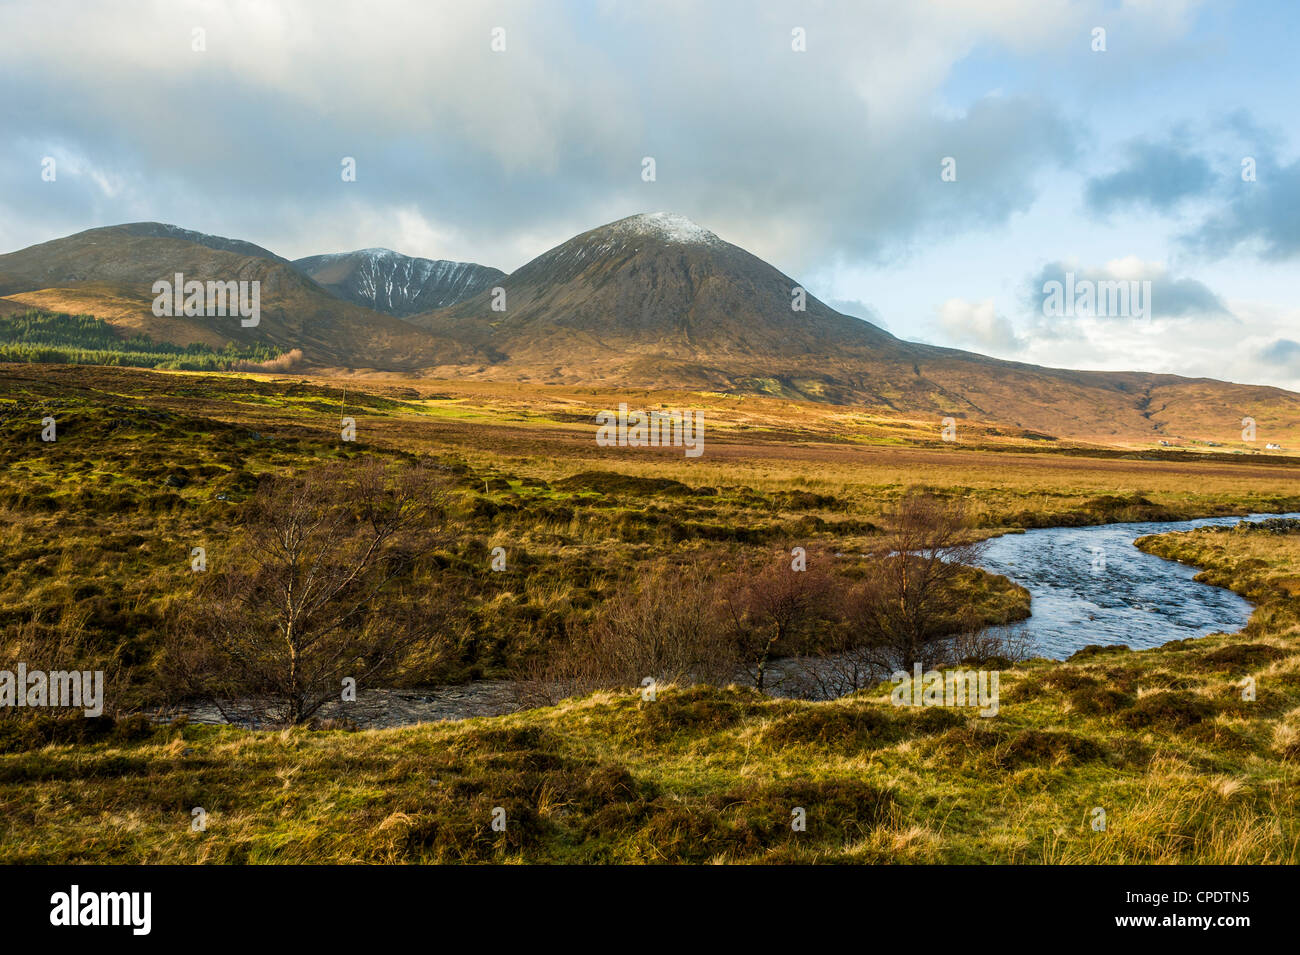 Mountainous view, Road to Elgol, Isle of Skye, Scotland, UK - Stock Image